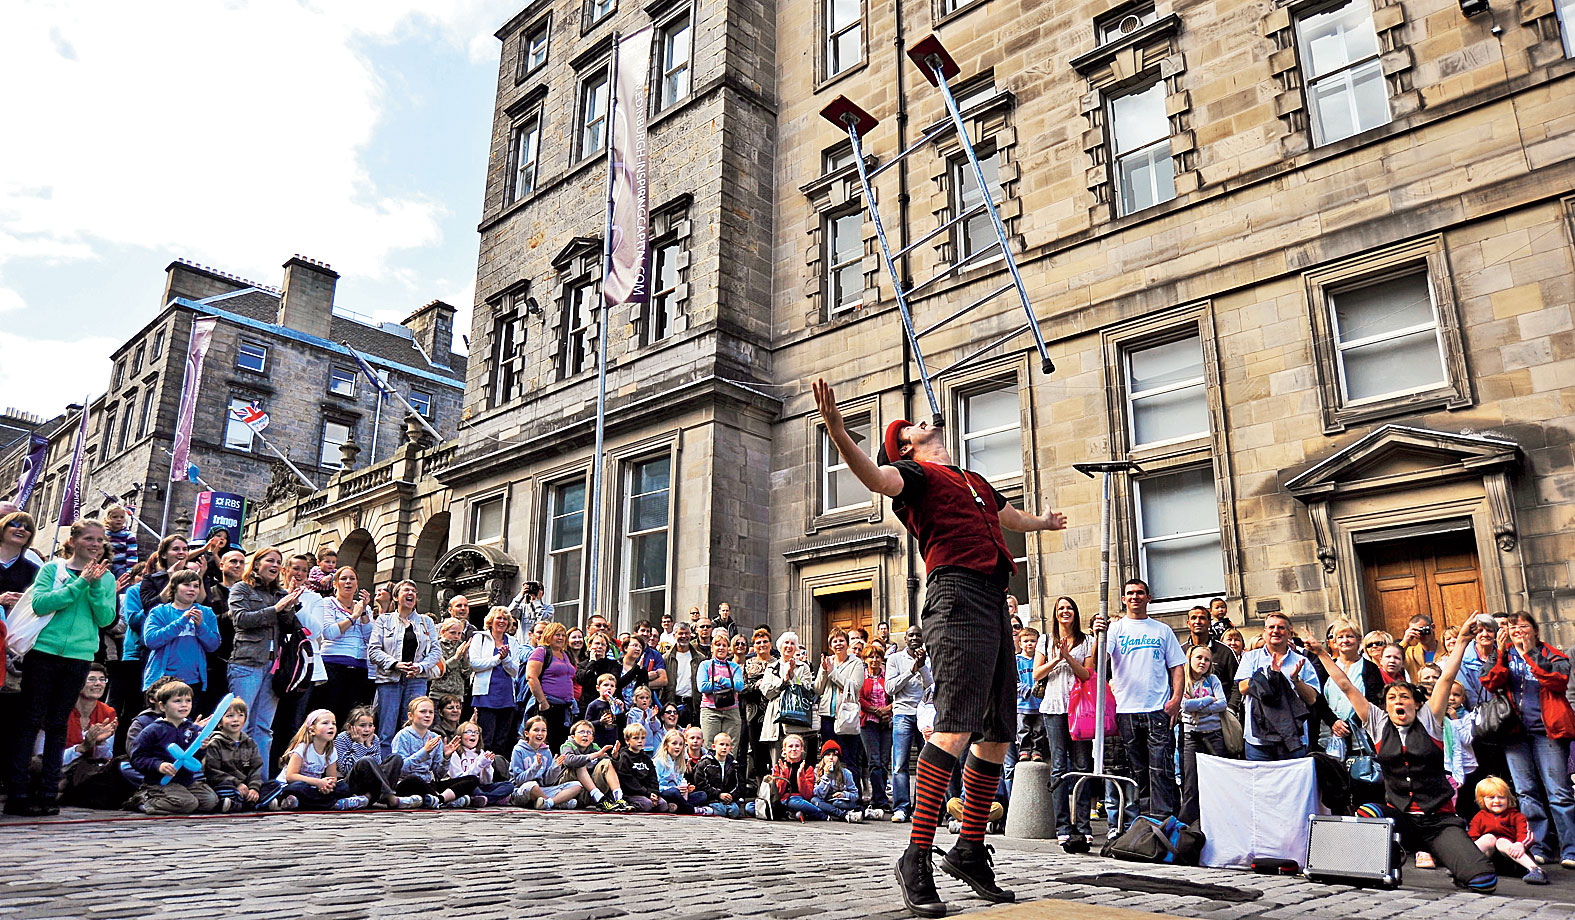 A moment from the Edinburgh Festival.